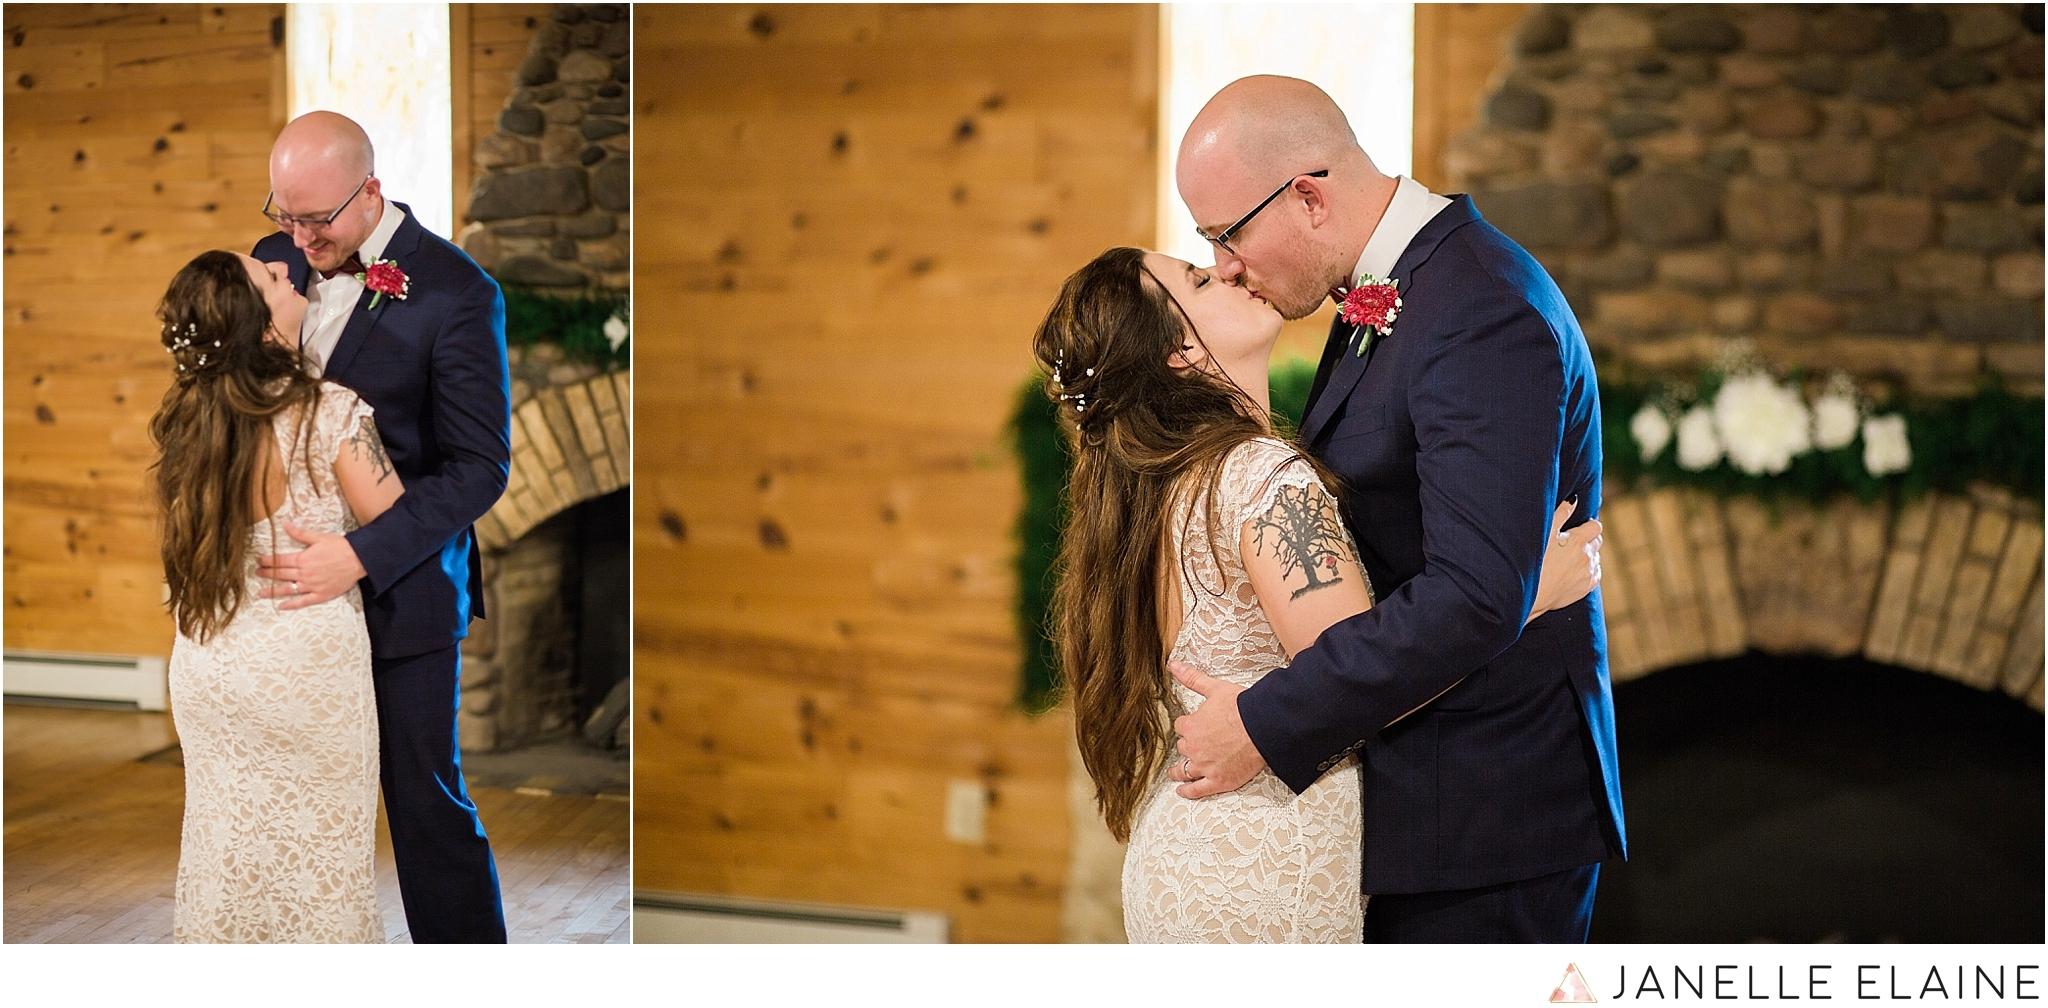 janelle elaine photography-seattle-destination-wedding-photographer-113.jpg